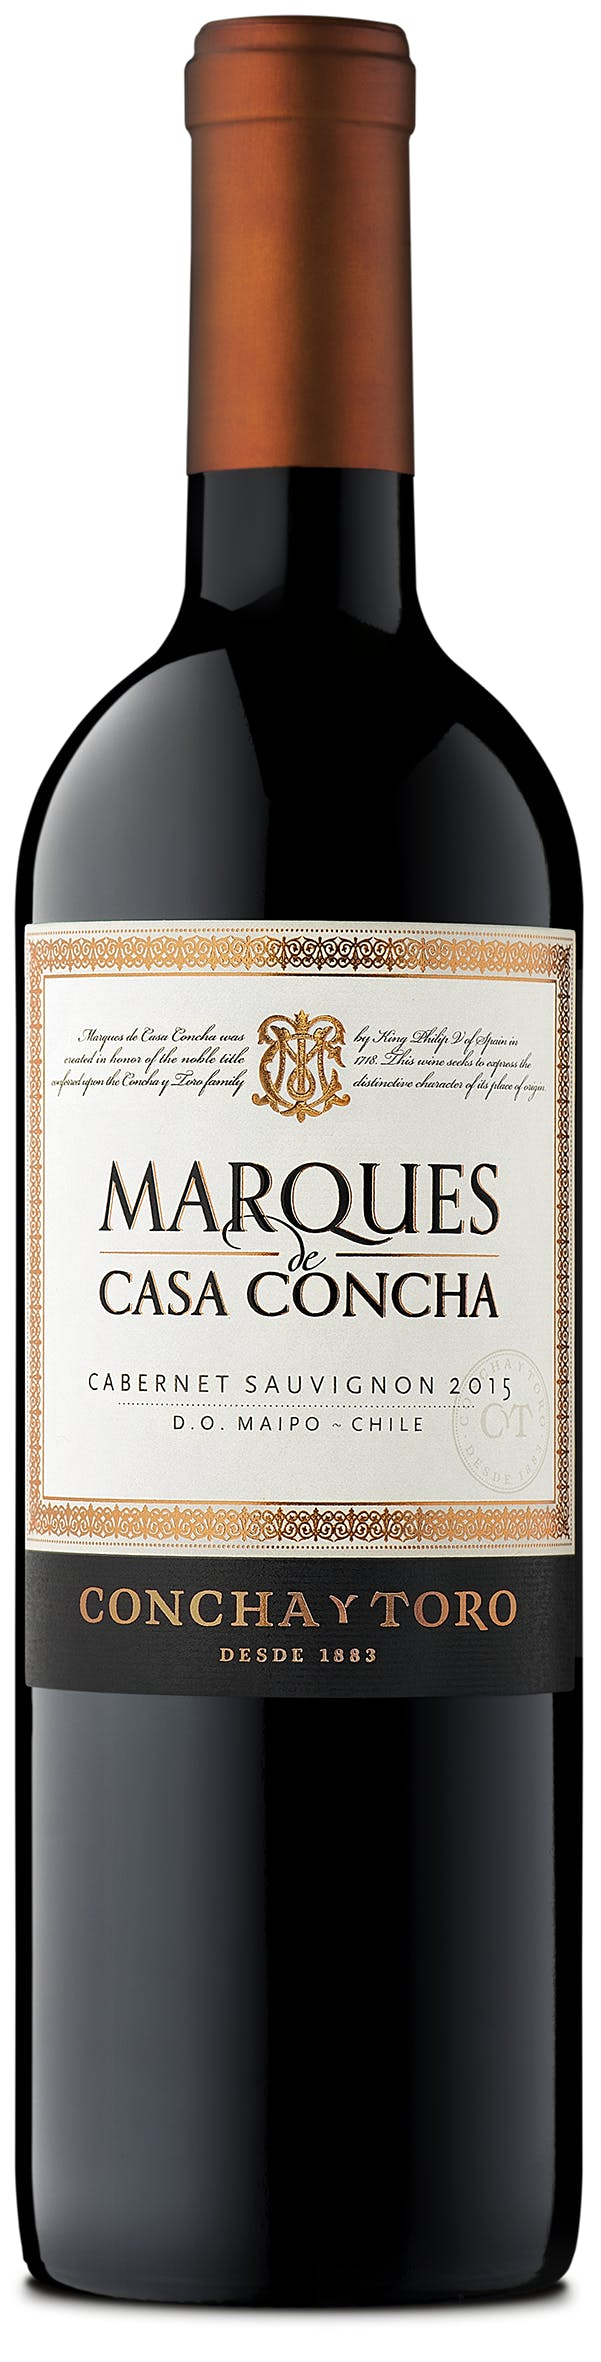 Concha Y Toro Marques De Casa Concha Cabernet Sauvignon 2016